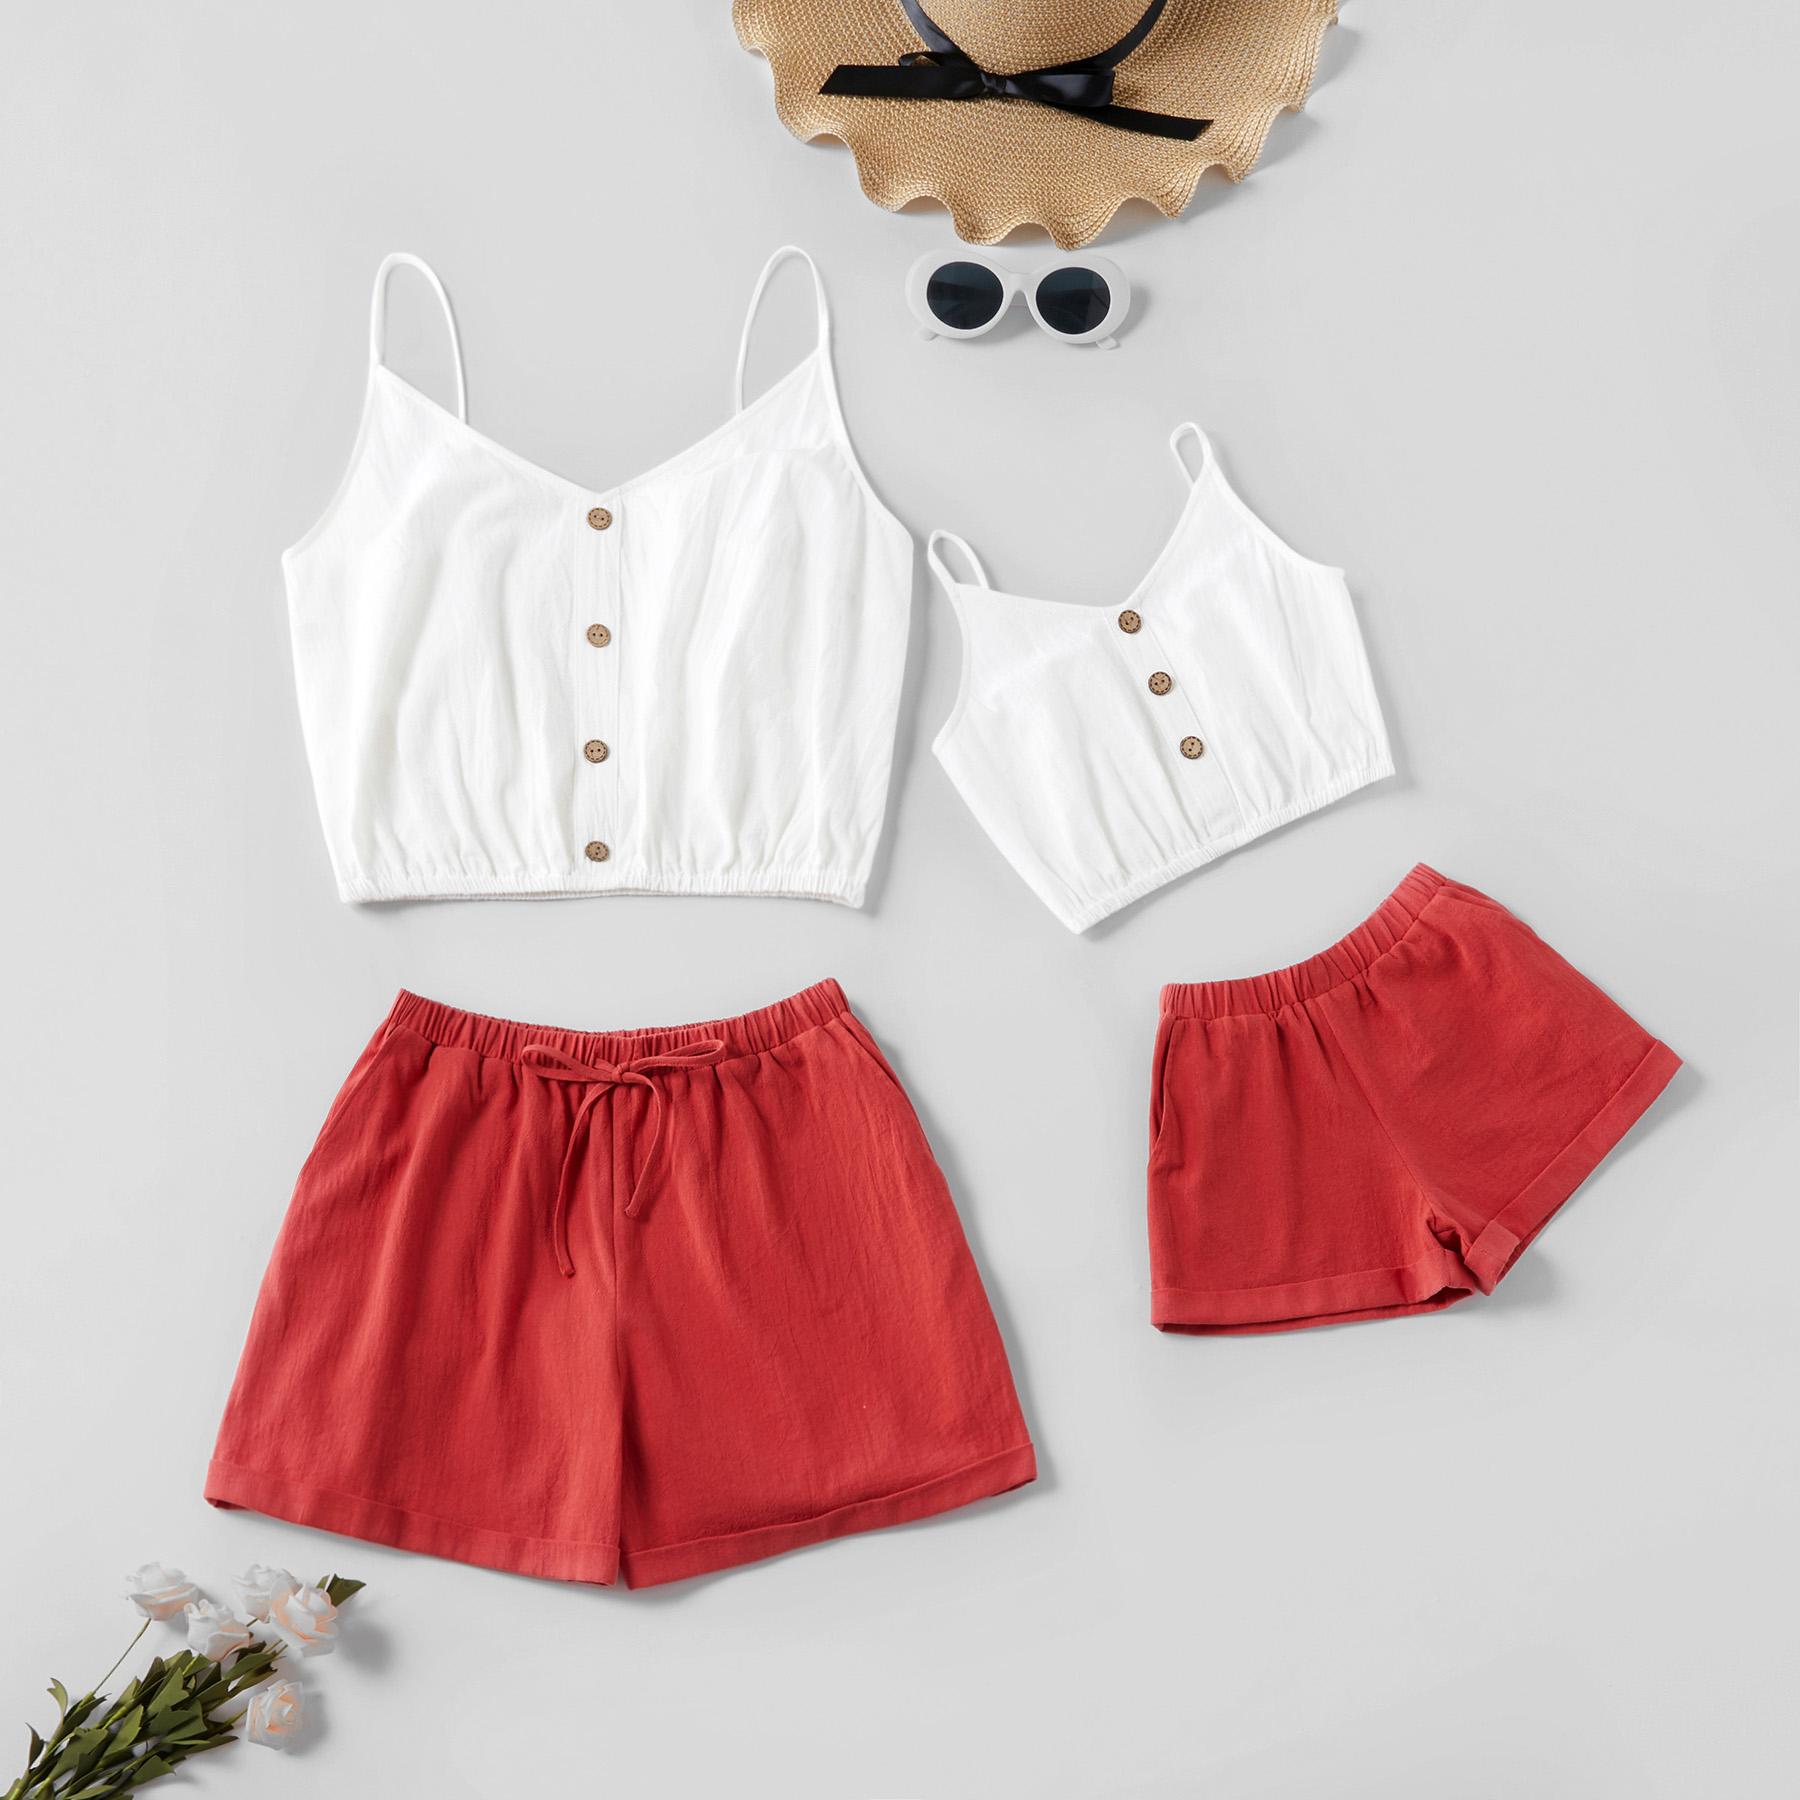 Sling Superior Sólida e Shorts Combinando Conjuntos